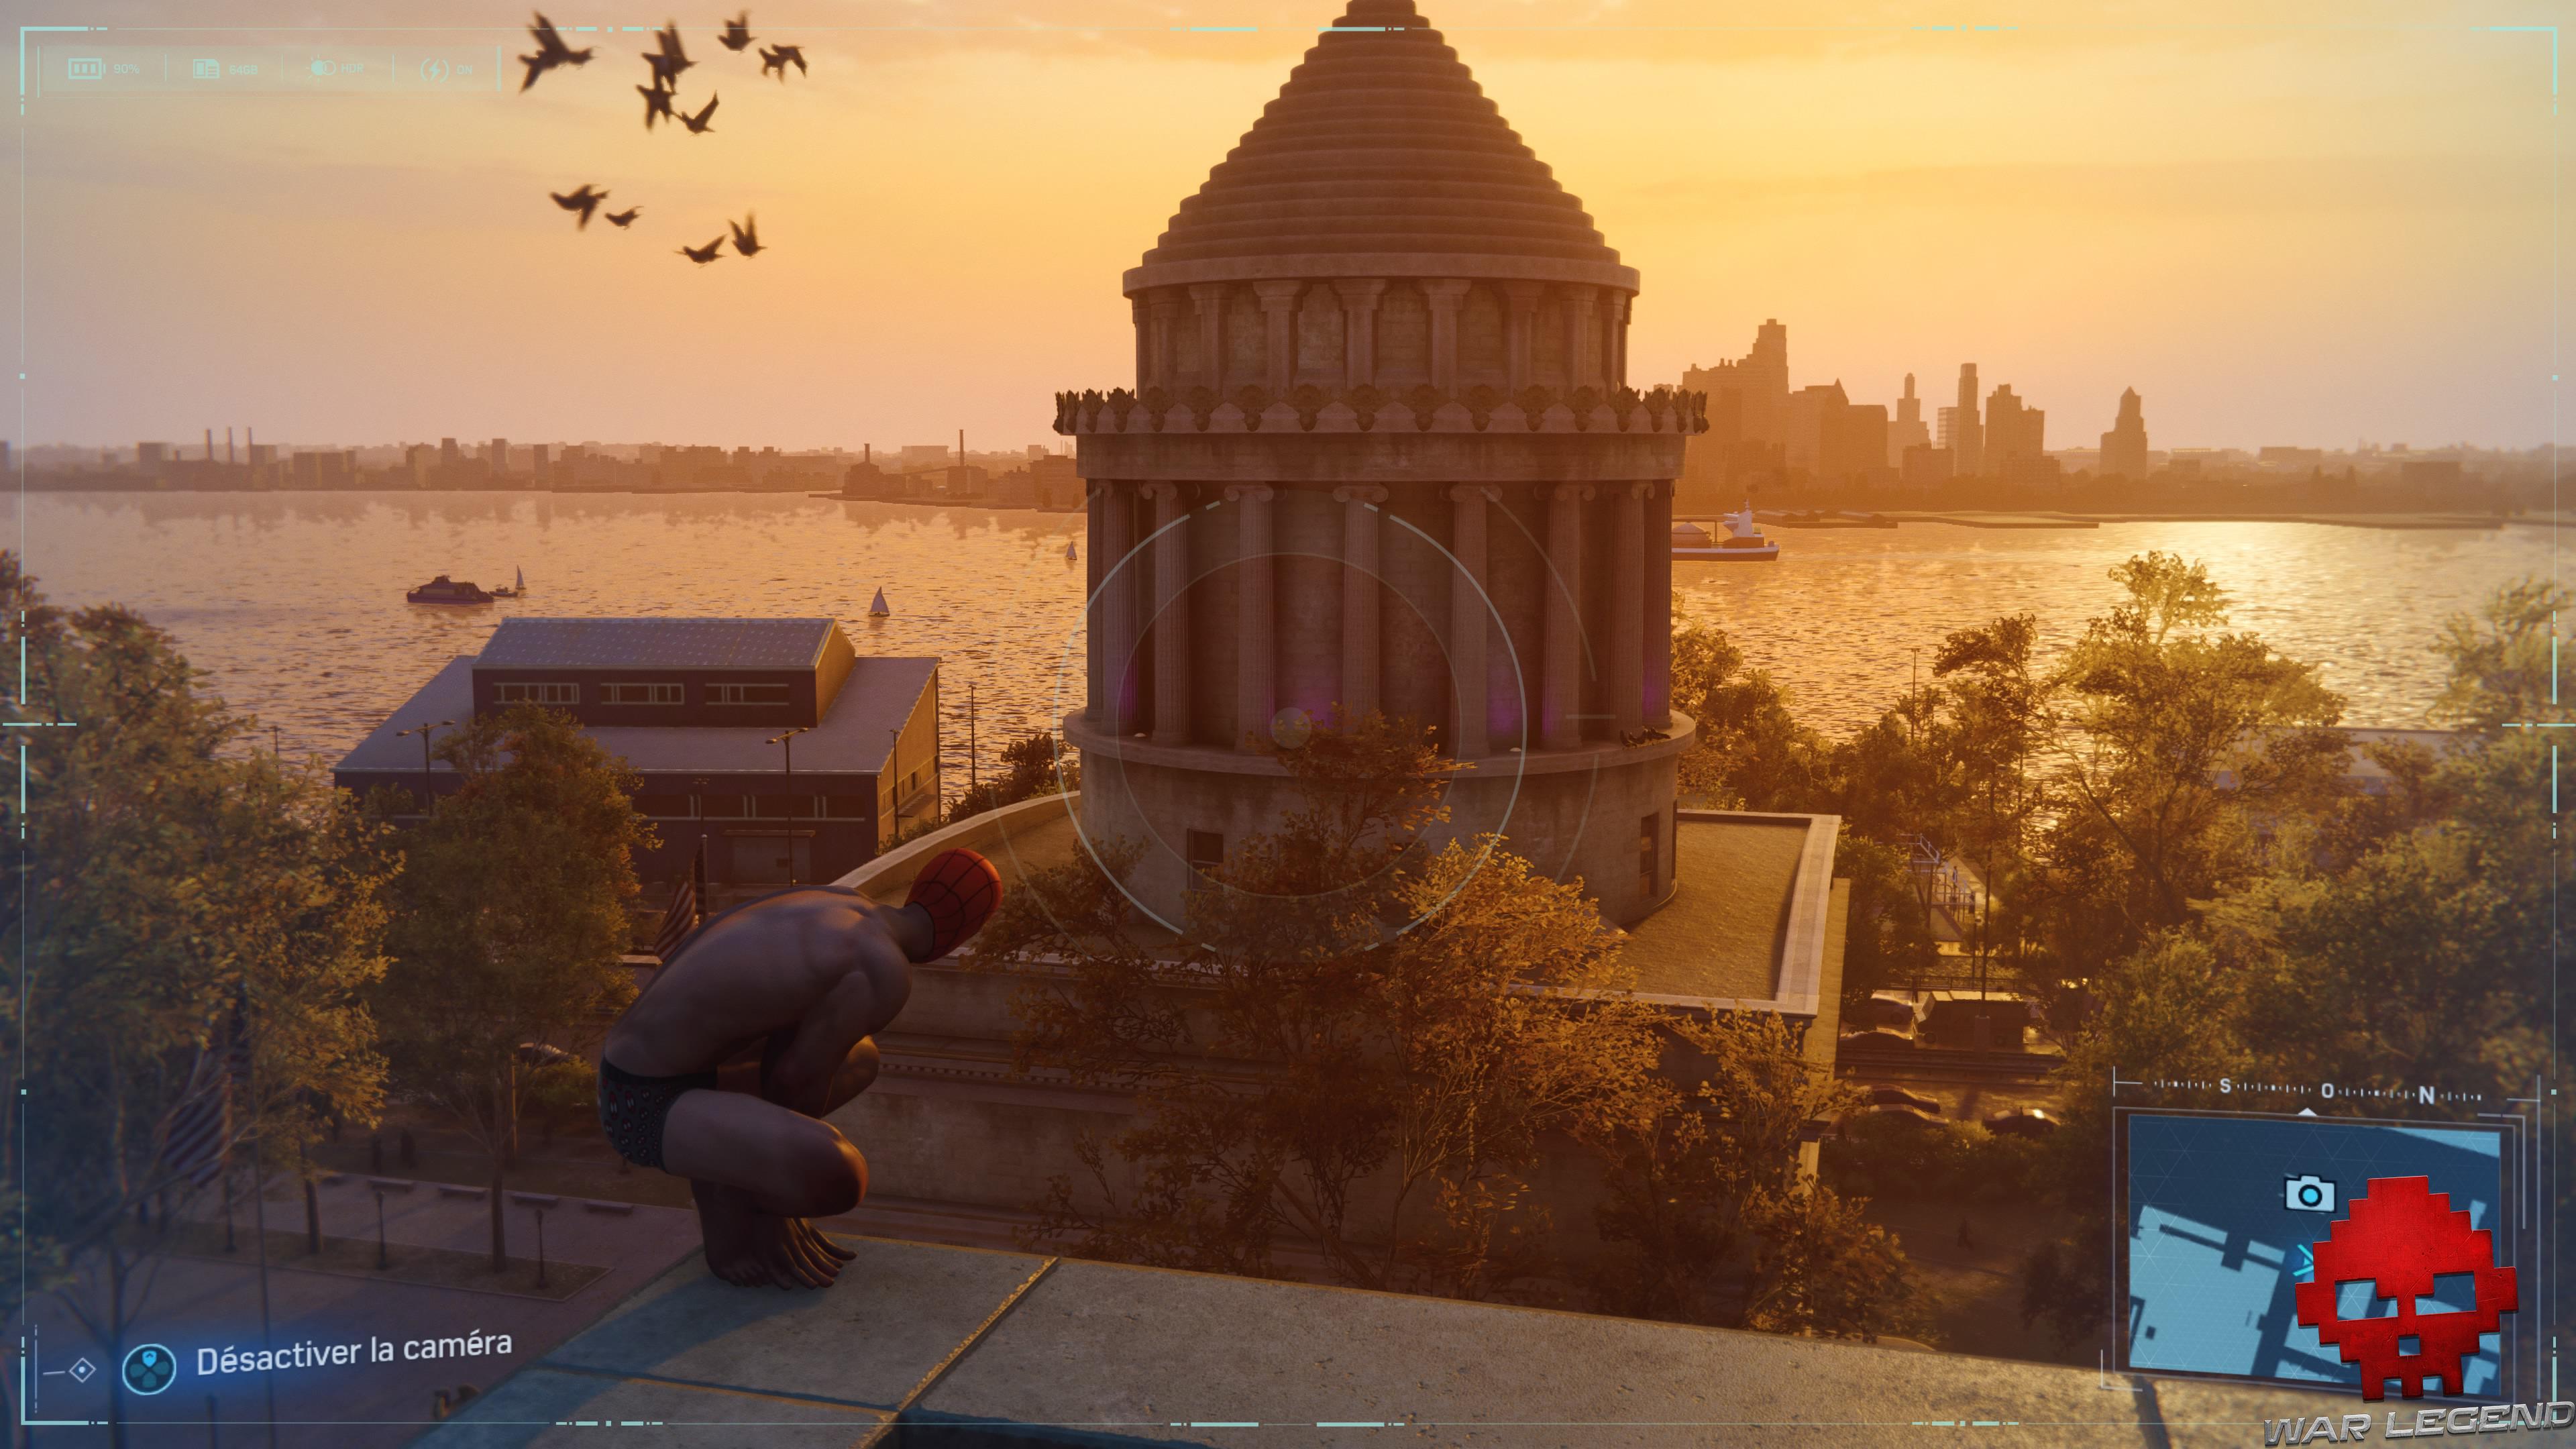 Spider-Man photo secrète General Grant National Memorial